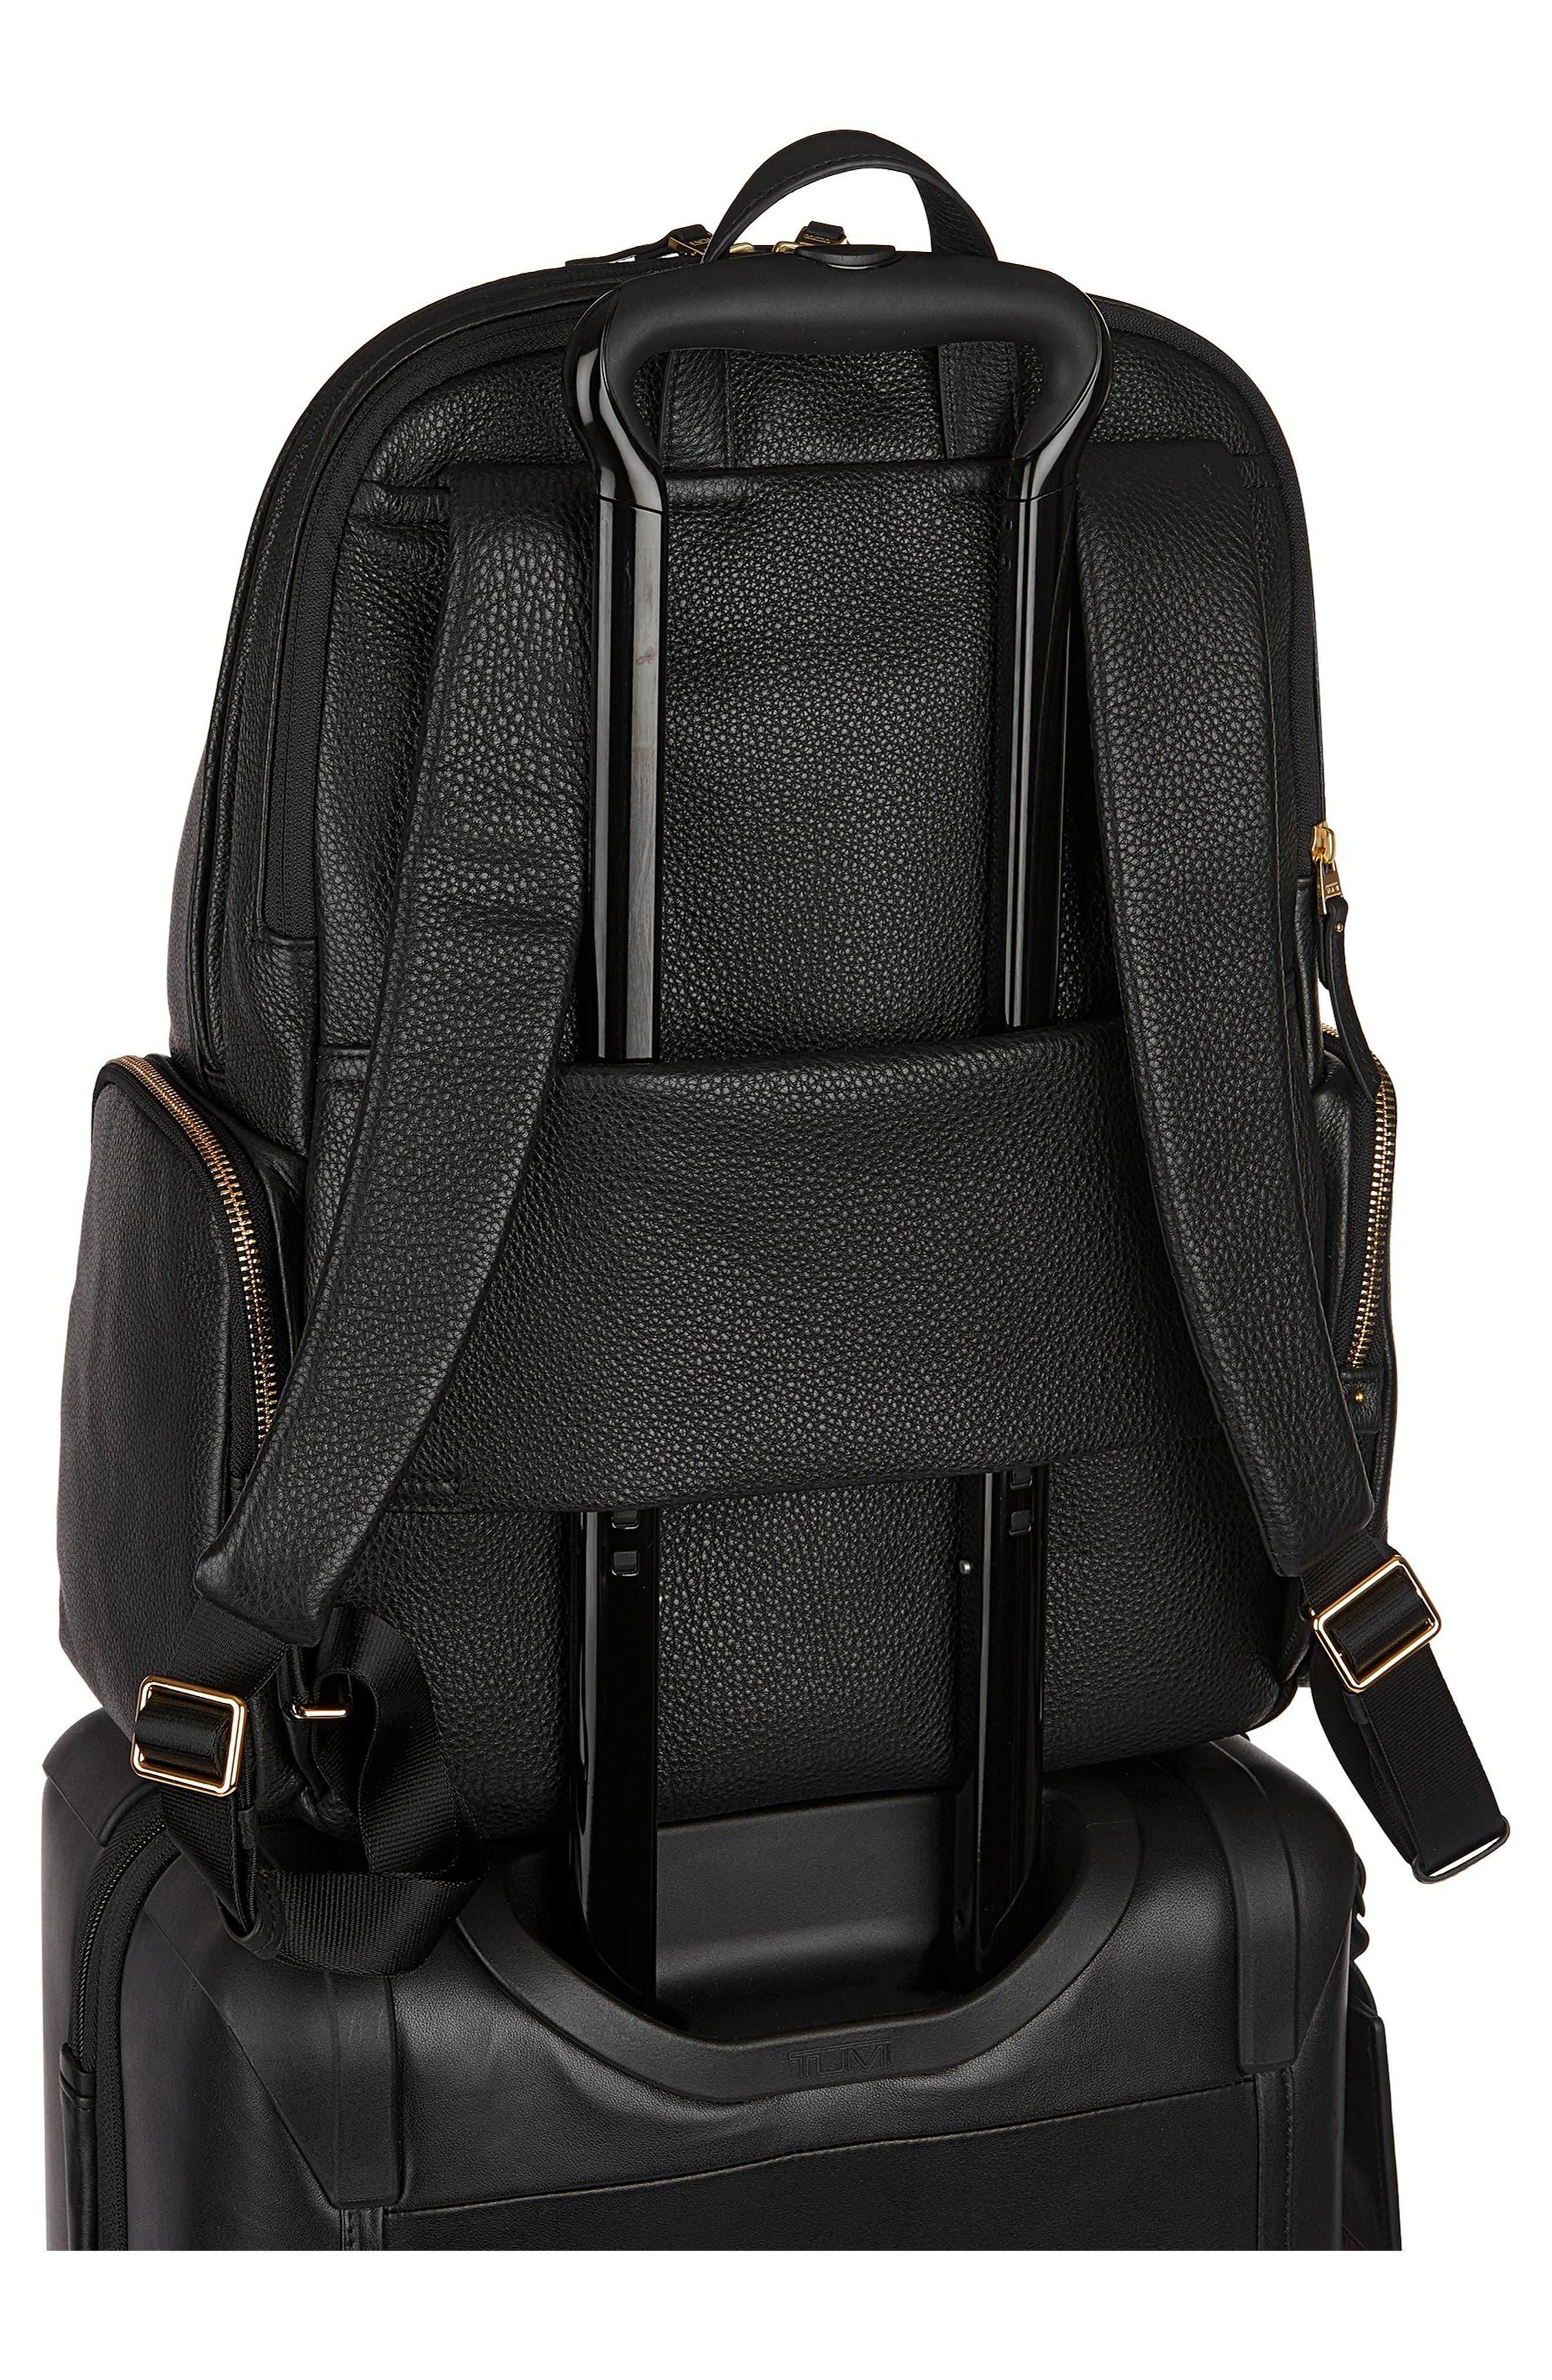 Calais Leather Computer Backpack,                             Alternate thumbnail 3, color,                             Black